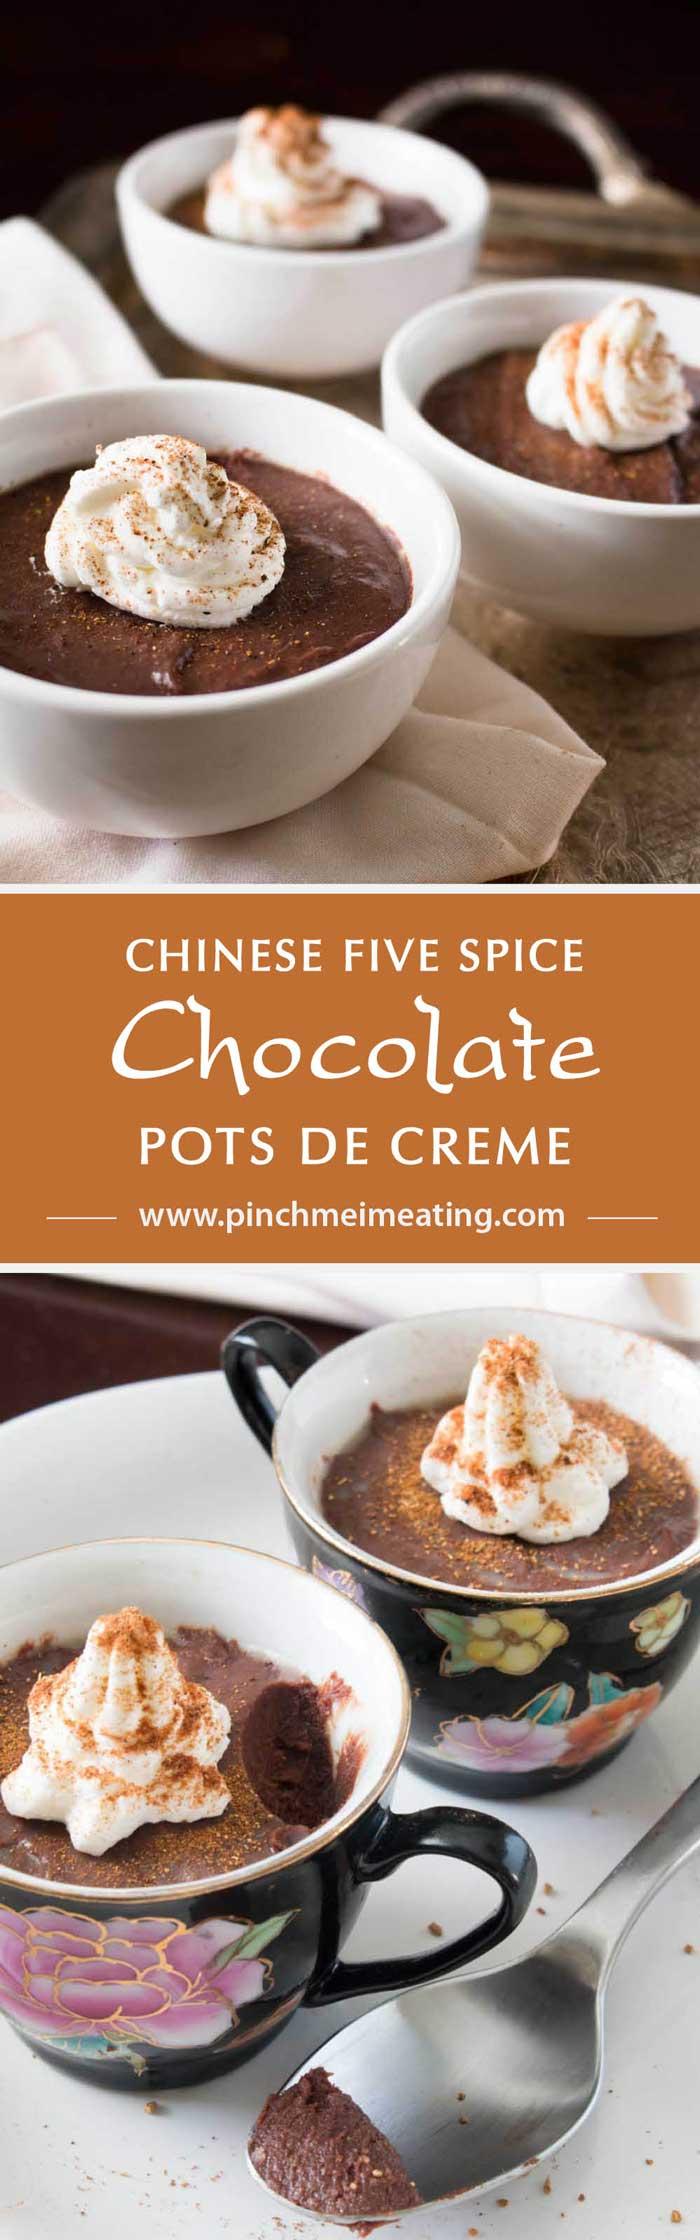 Chinese Five Spice Chocolate Pots de Creme   Pinch me, I'm ...